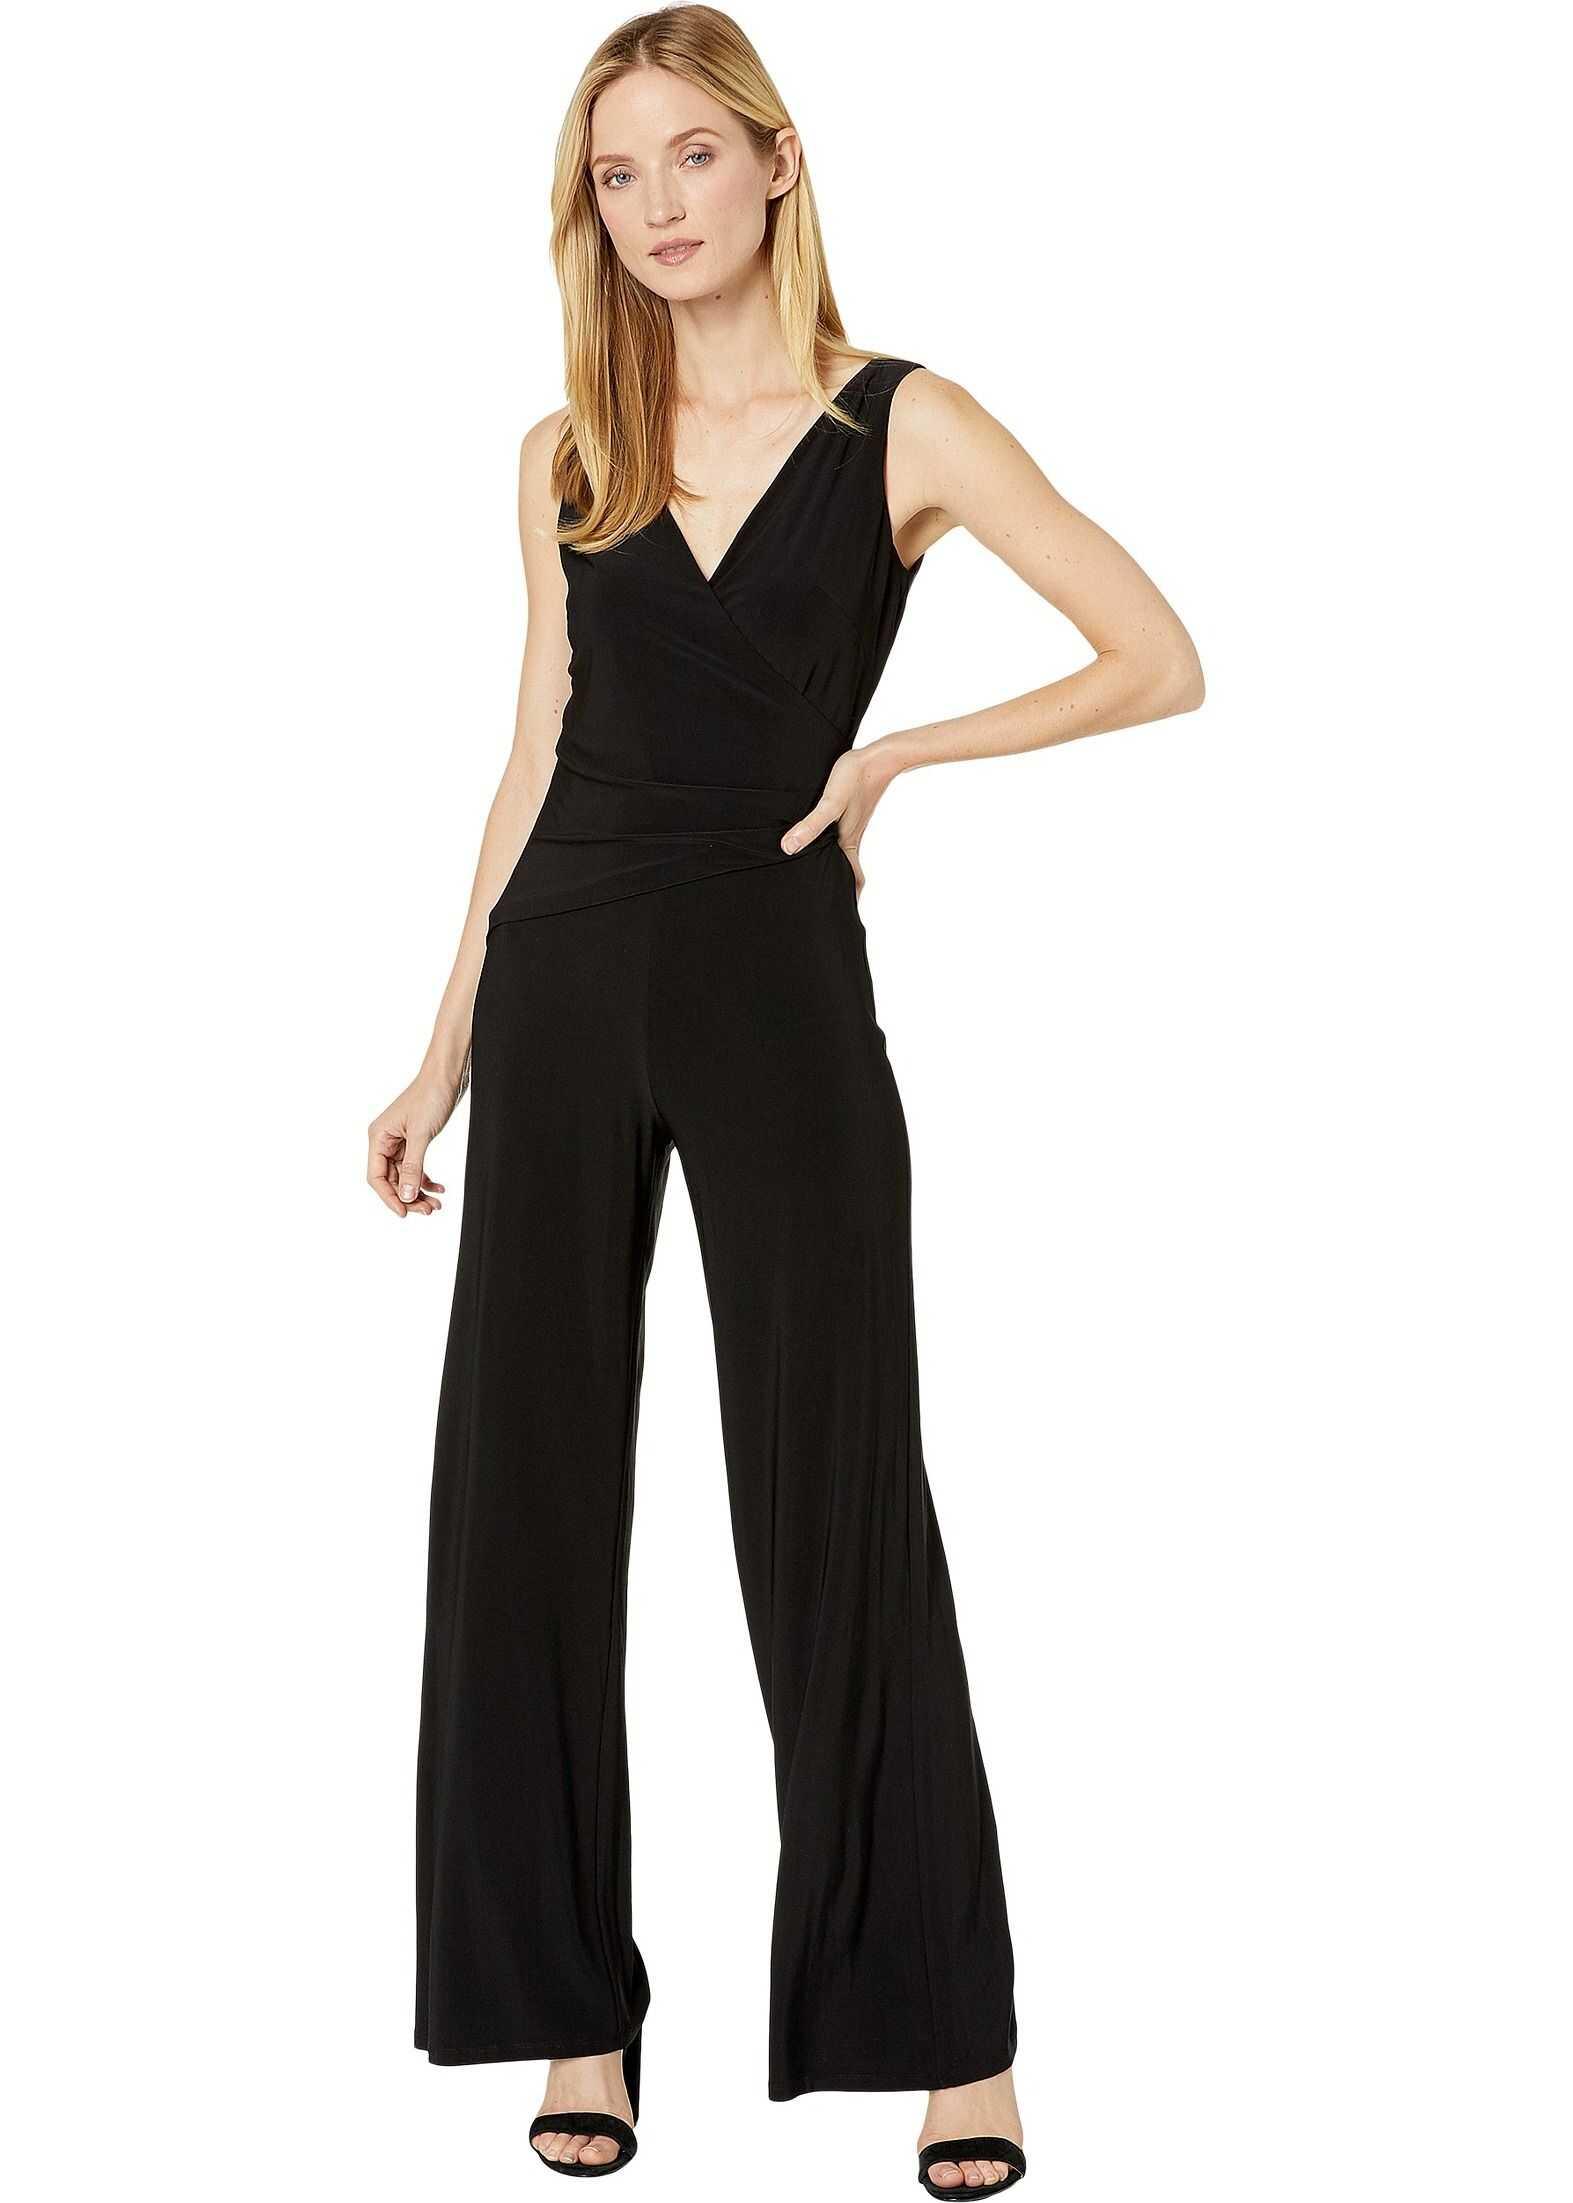 Nine West Ity Sleeveless Jumpsuit w/ Surplus Detail & Asymmetrical Bodice Black